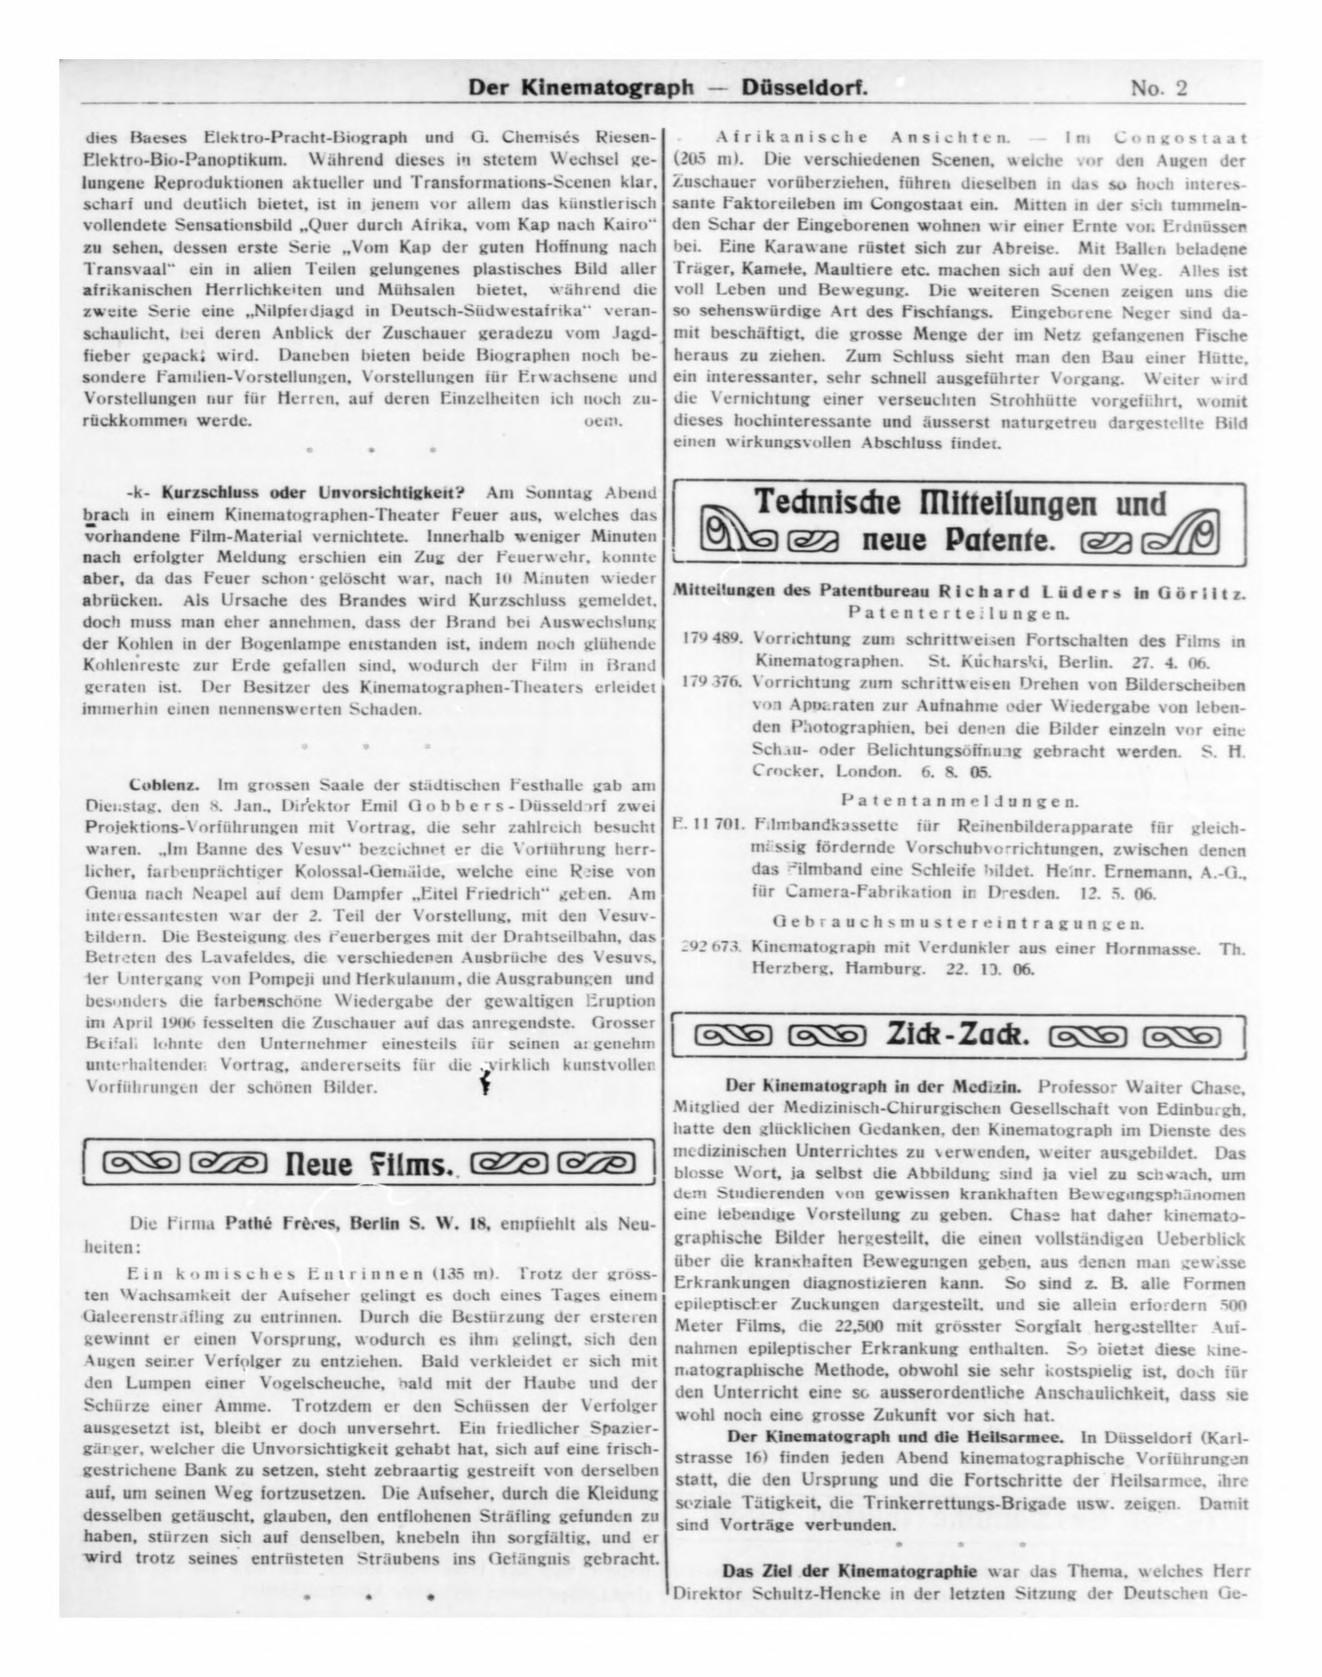 Kinematograph01-1907-01_jp2.zip&file=kinematograph01-1907-01_jp2%2fkinematograph01-1907-01_0018